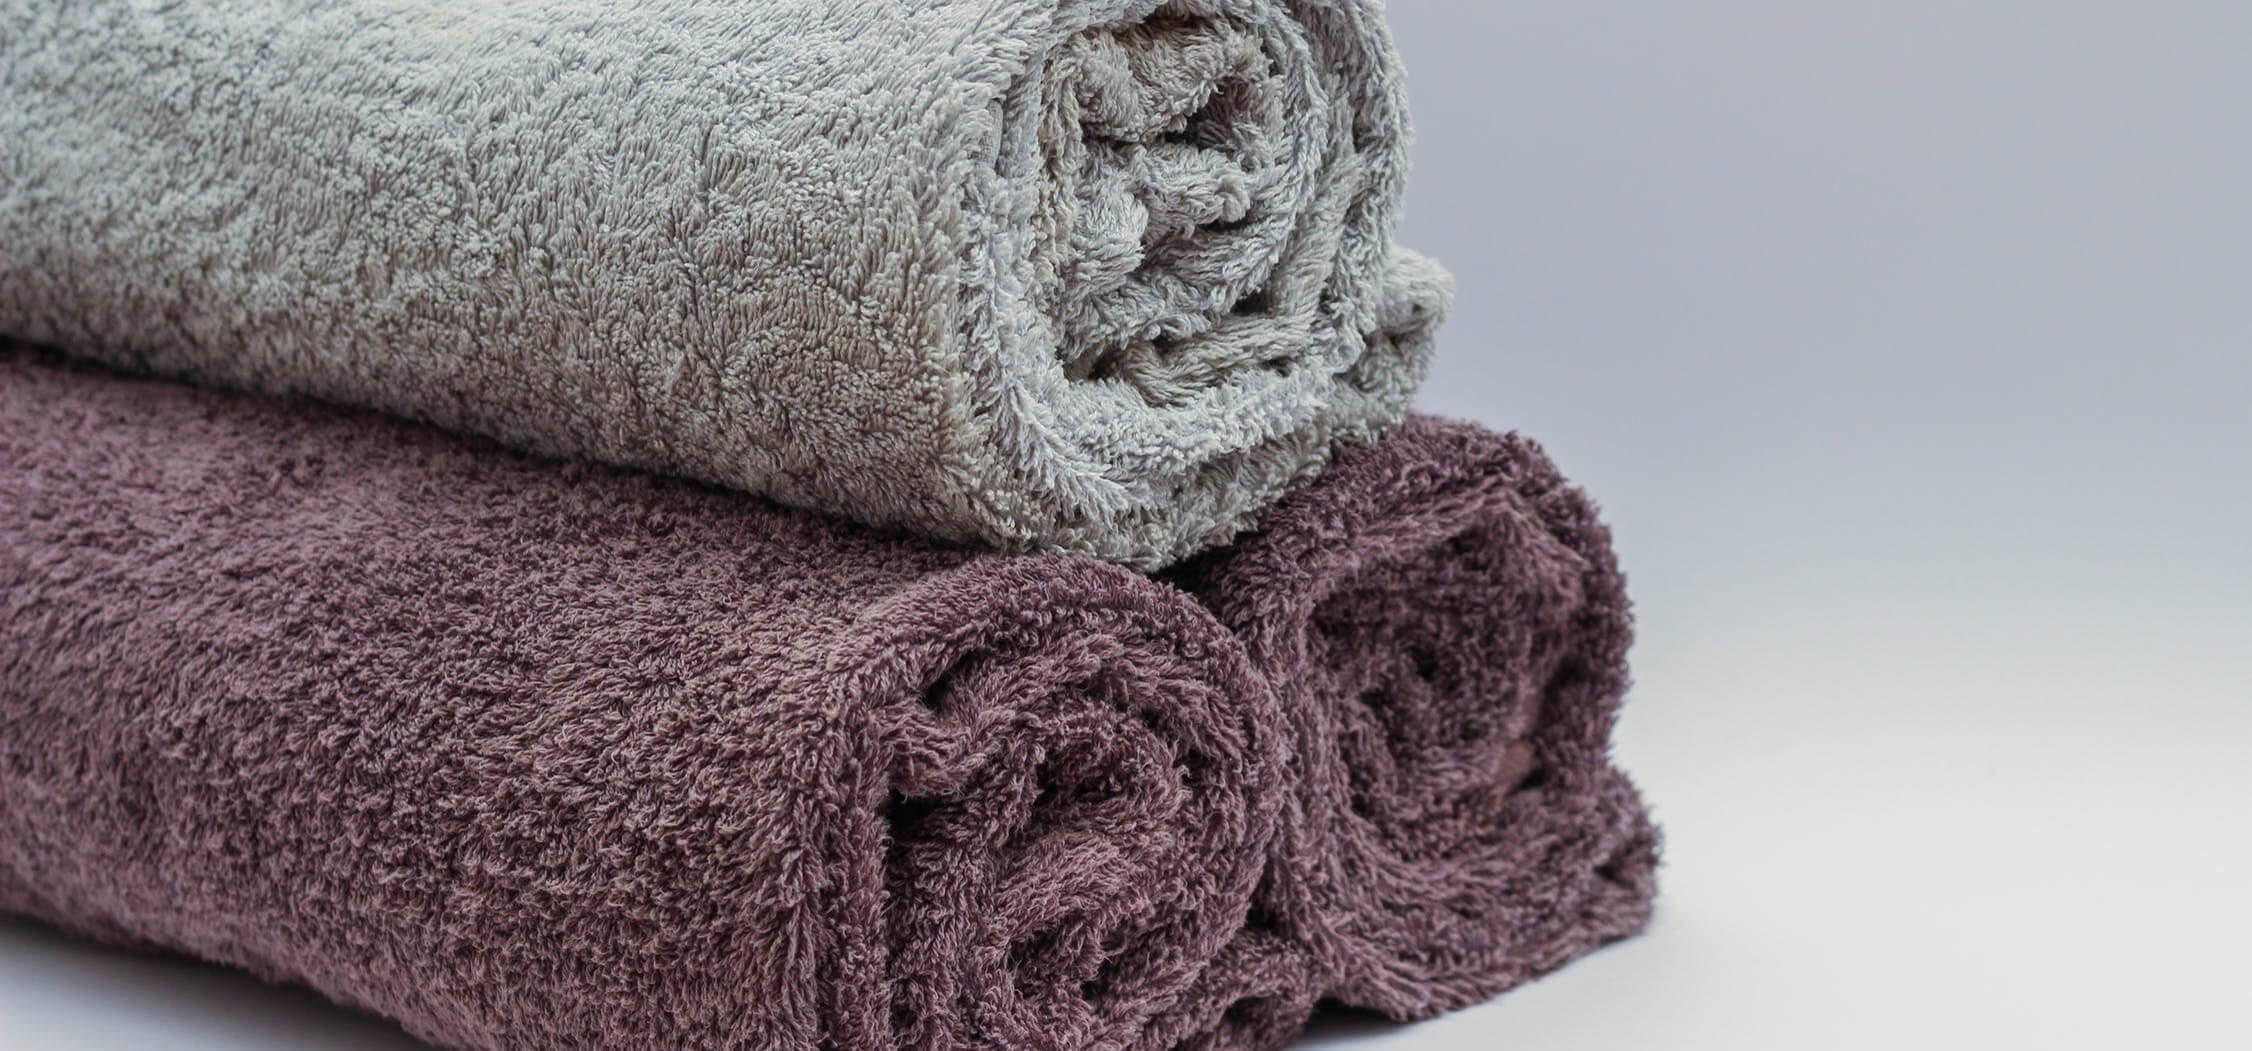 6-ways-to-transform-your-rental-bathroom-on-a-budget-7.jpeg